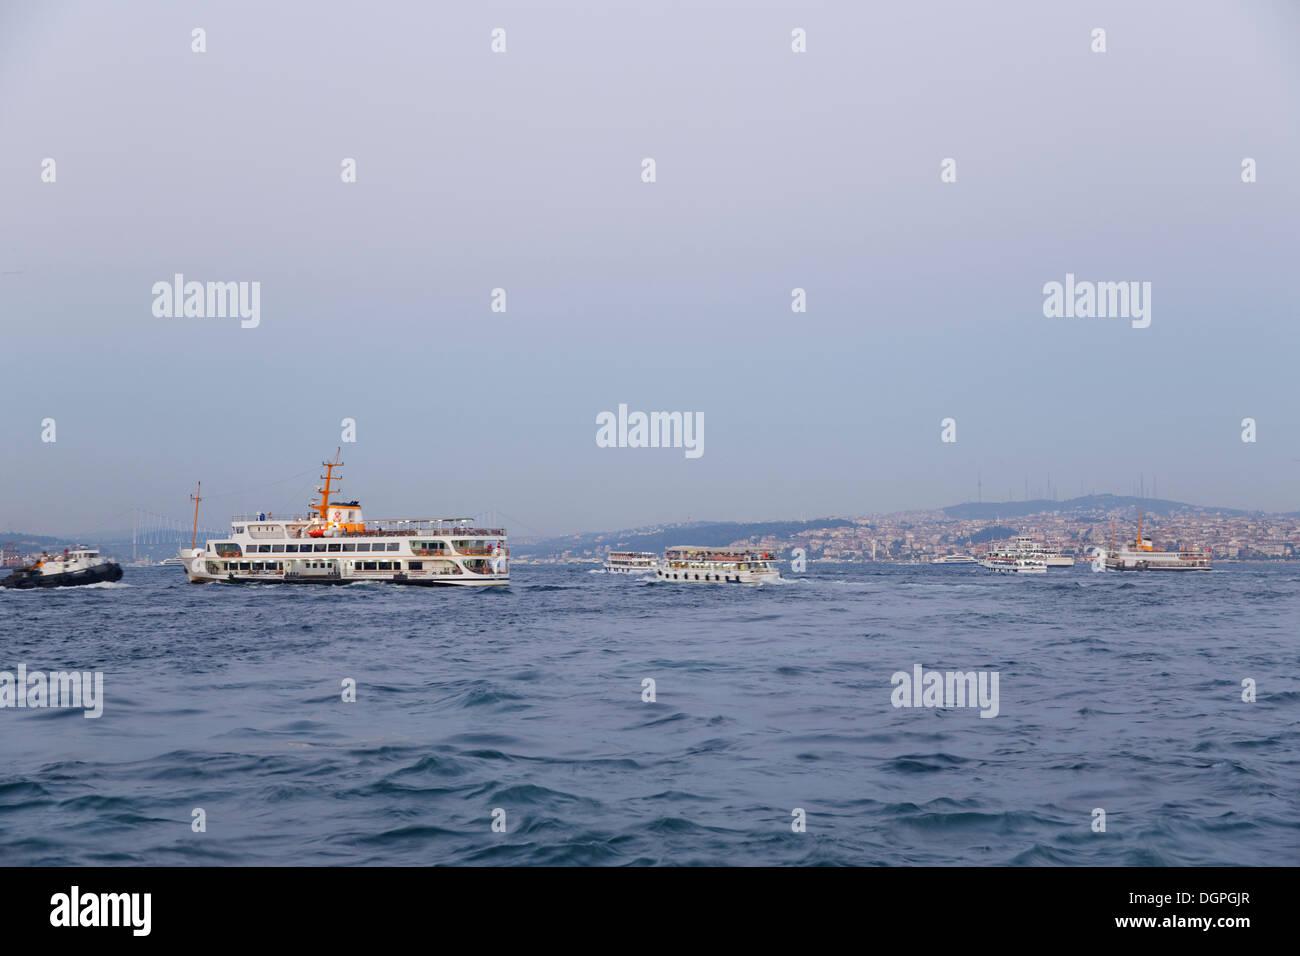 Ferries, Bosphorus, Istanbul, Turkey, Europe, Üsküdar in Asia on the right - Stock Image